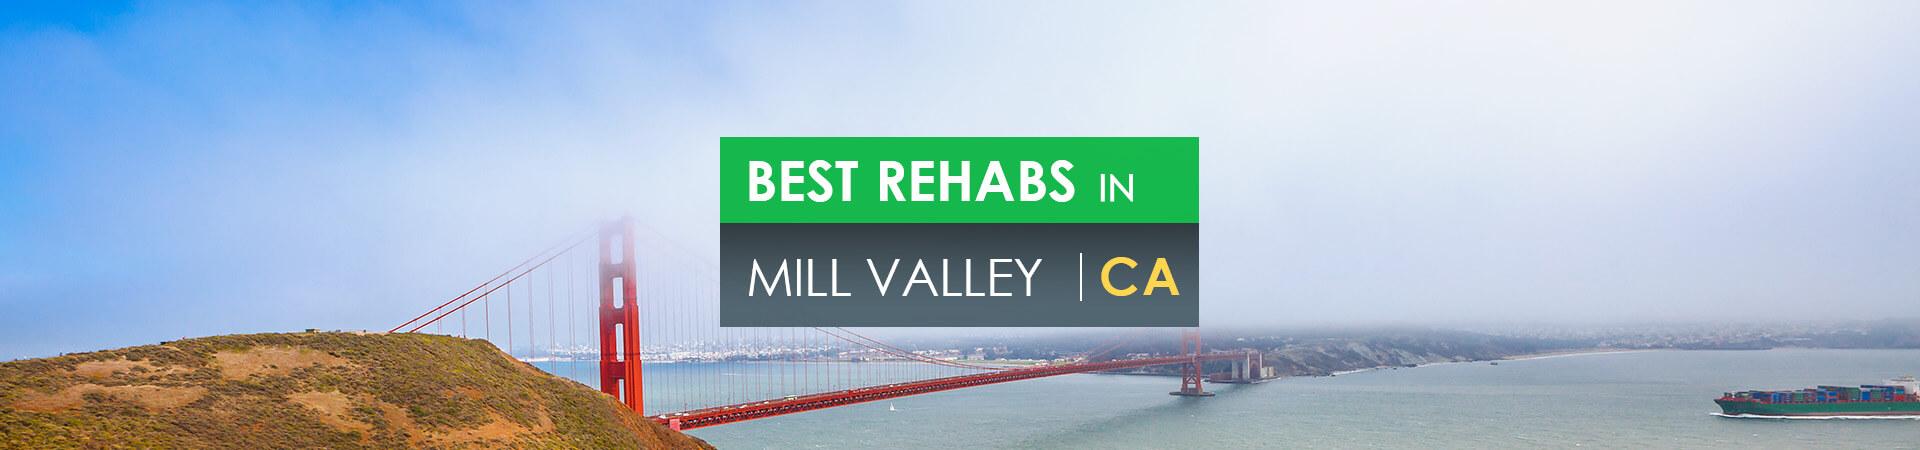 Best rehabs in Mill Valley, CA